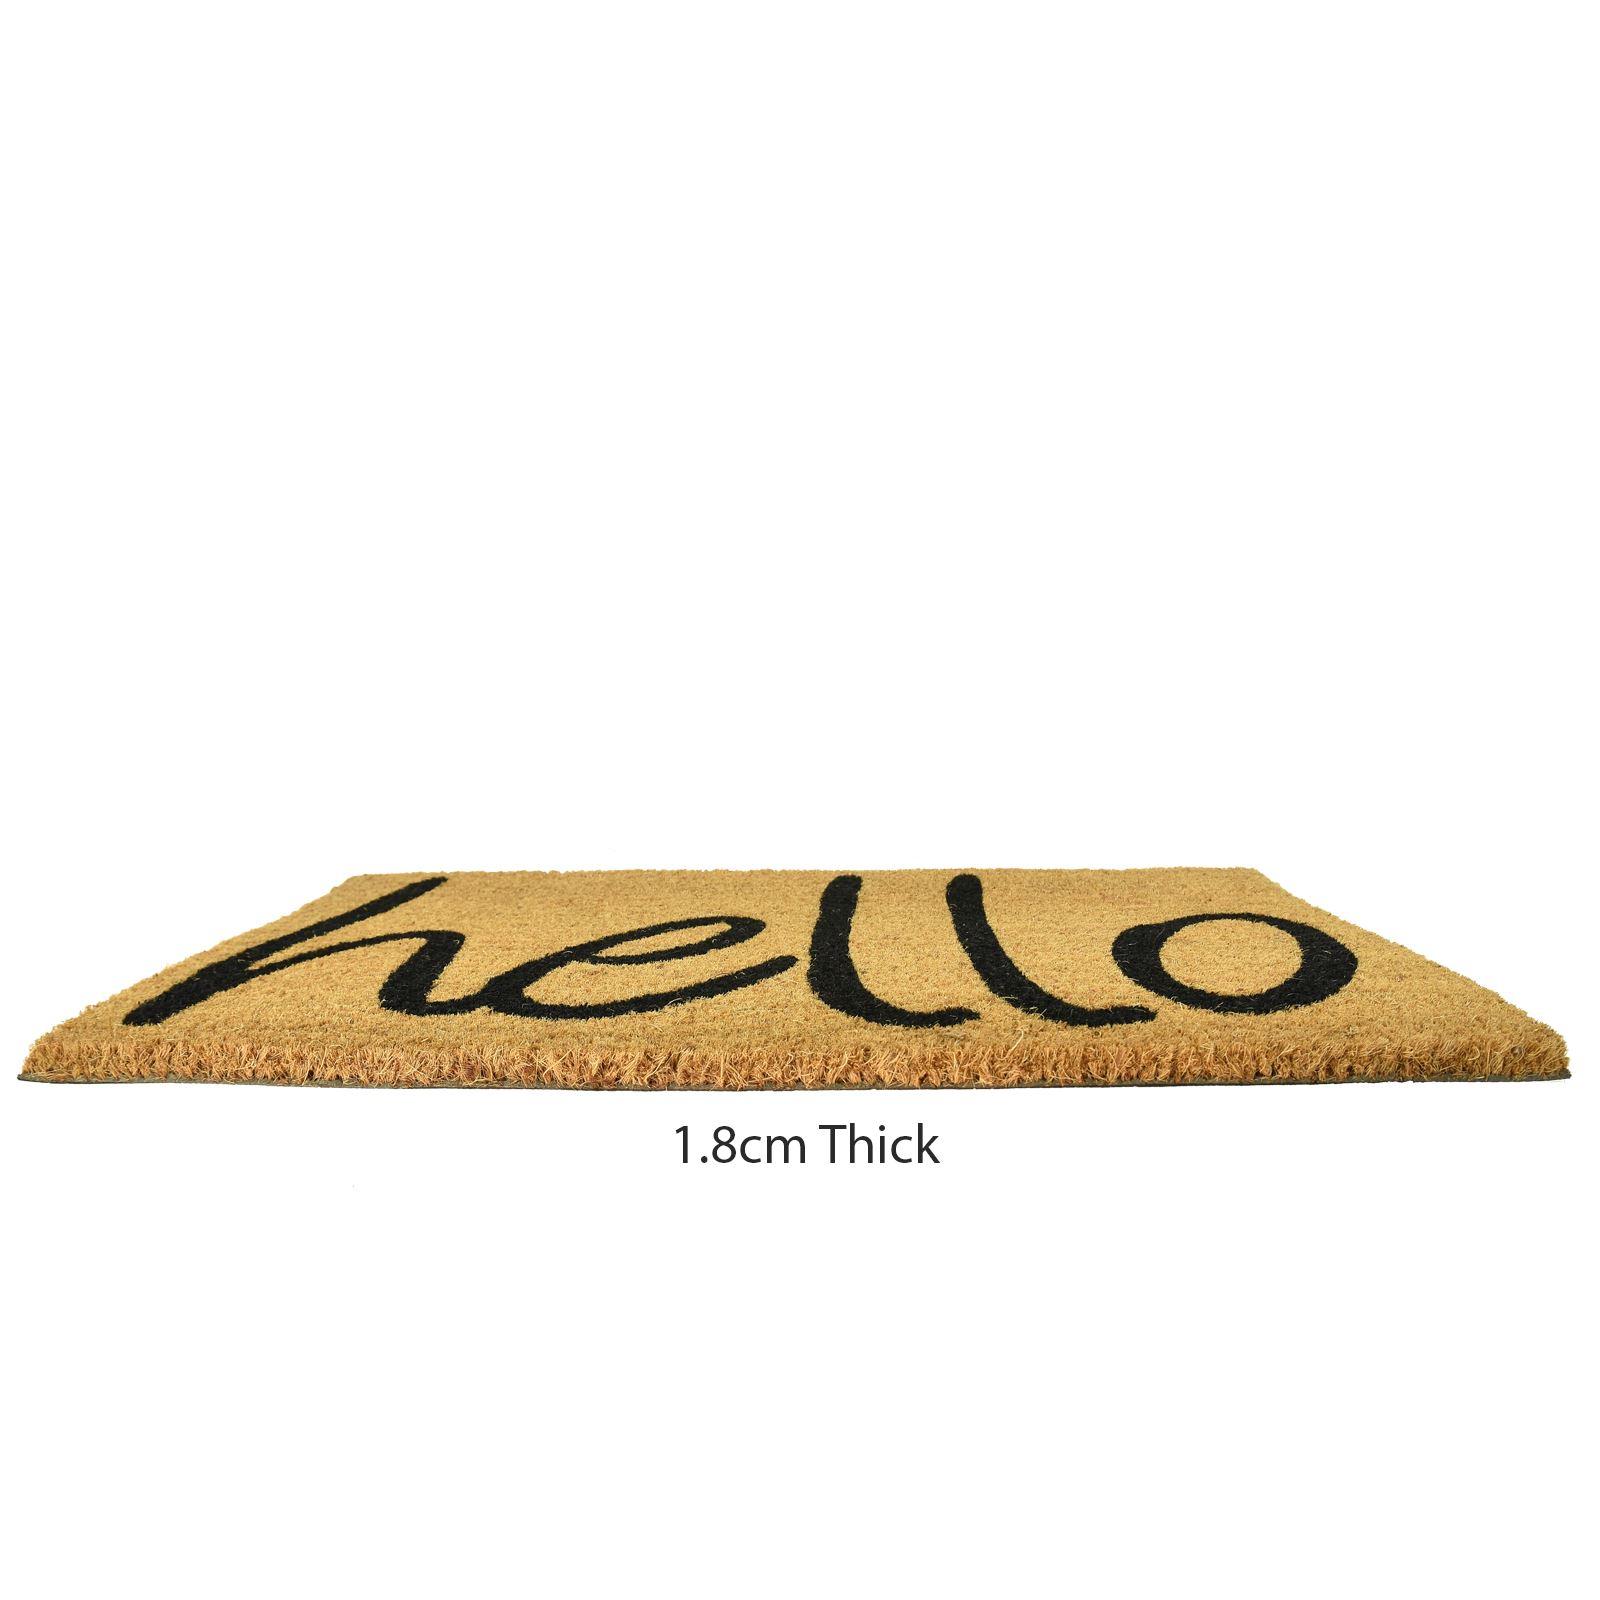 Plain-Non-Slip-Door-Mat-Tough-Natural-Coir-PVC-Back-Welcome-Doormat-40-x-60cm miniatura 62